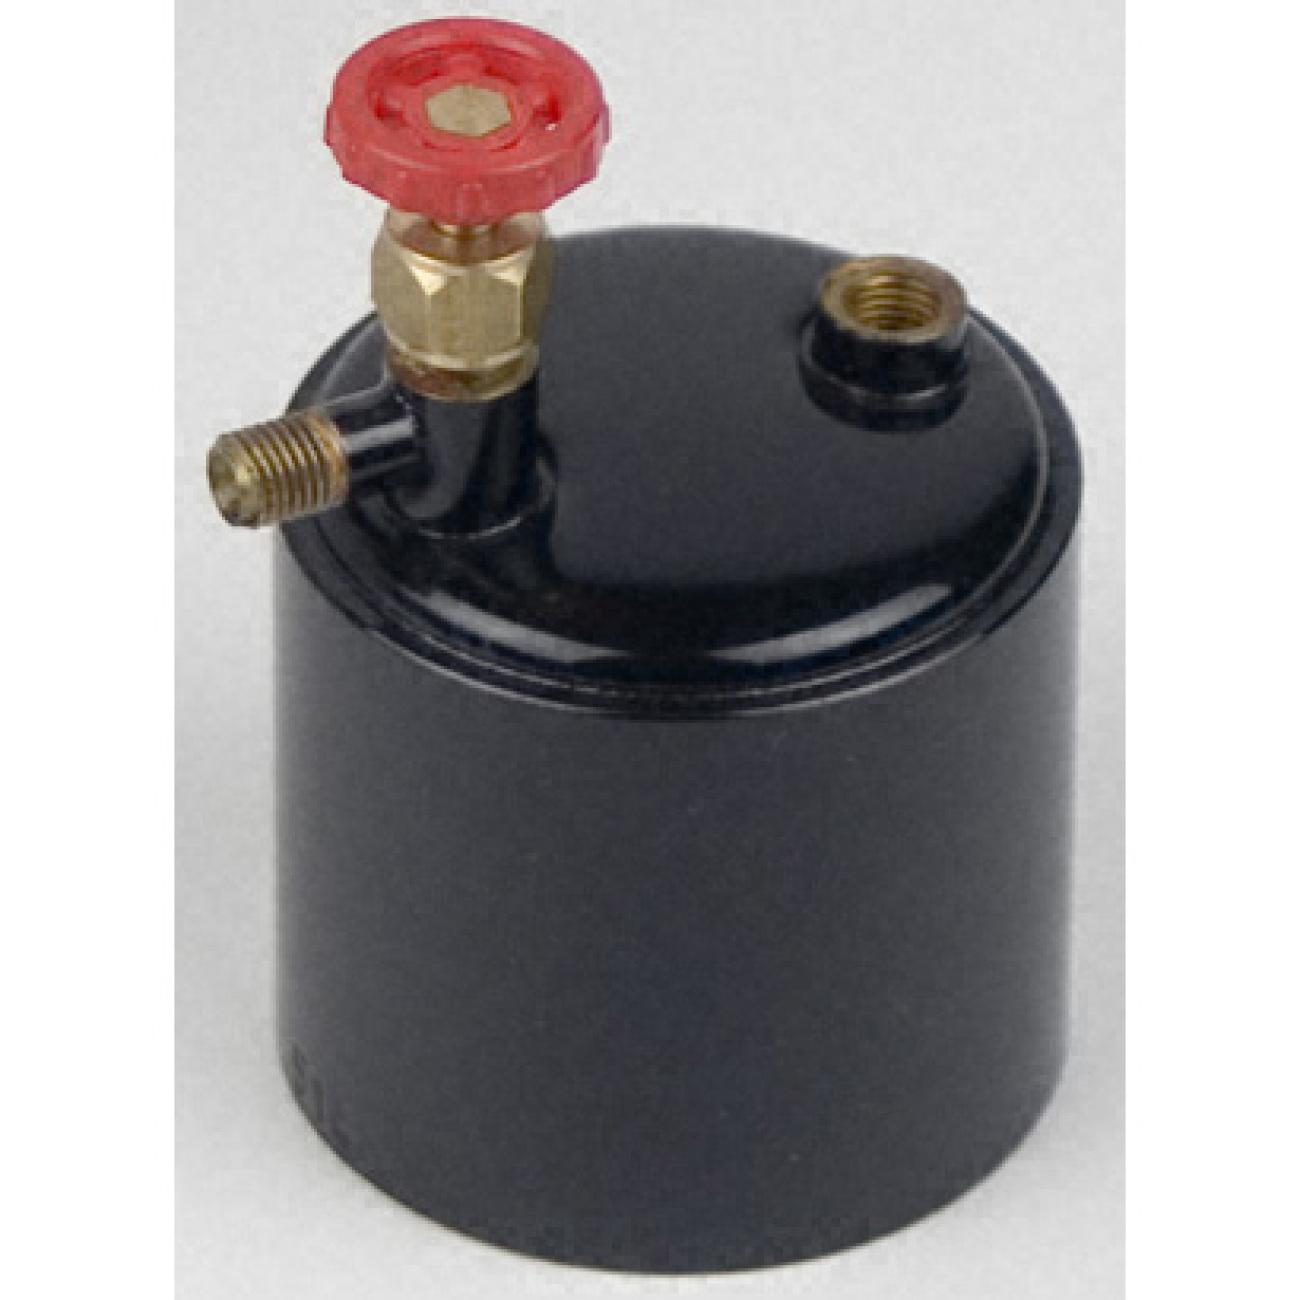 BIX 16 - Refillable Gas Tank - Small